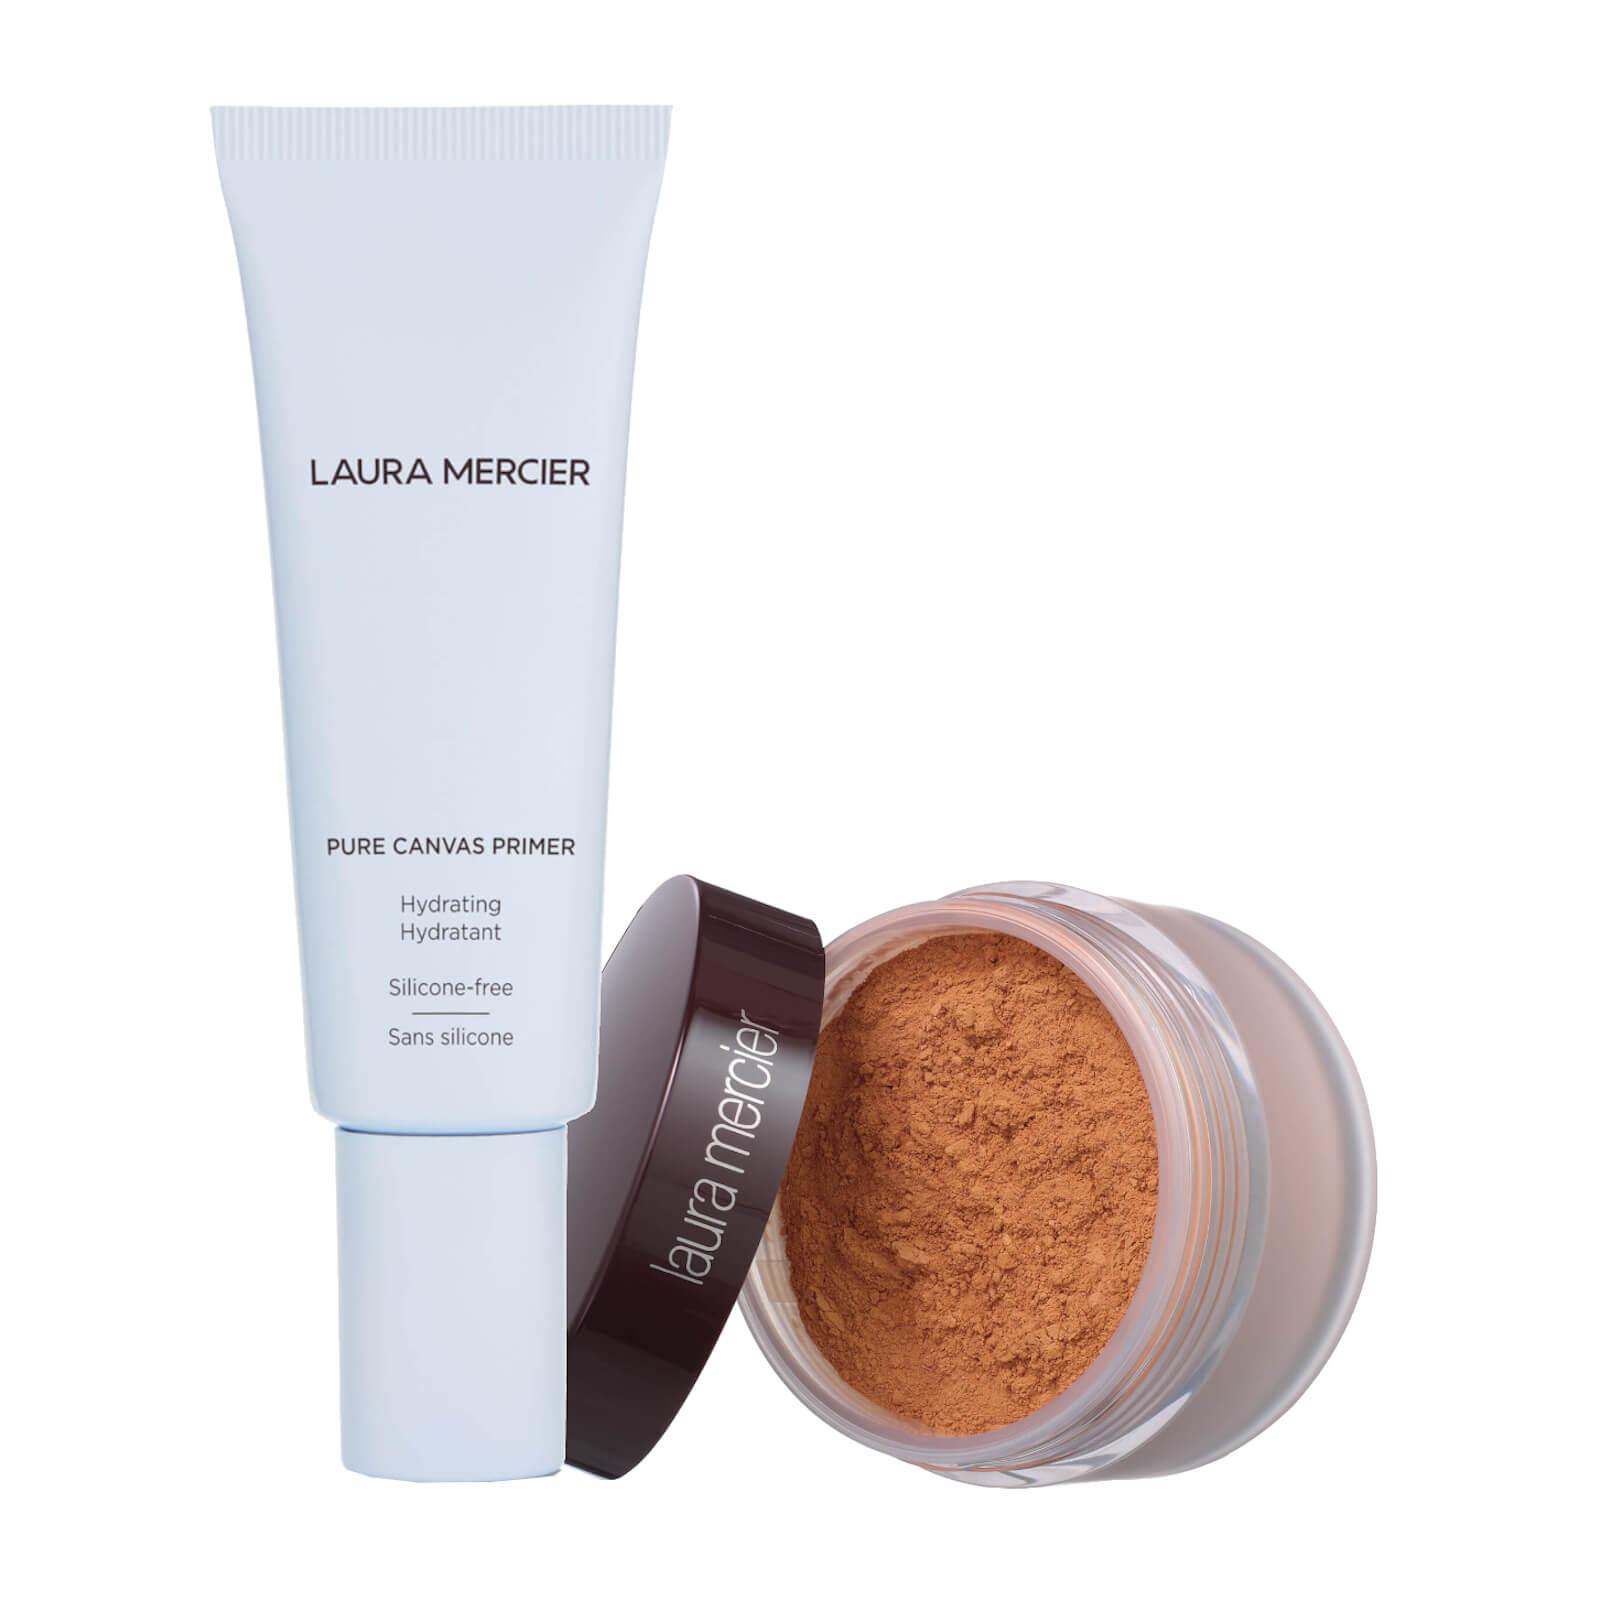 Laura Mercier Pure Canvas Primer Hydrating & Translucent Loose Setting Powder (Various Shades) - Medium Deep